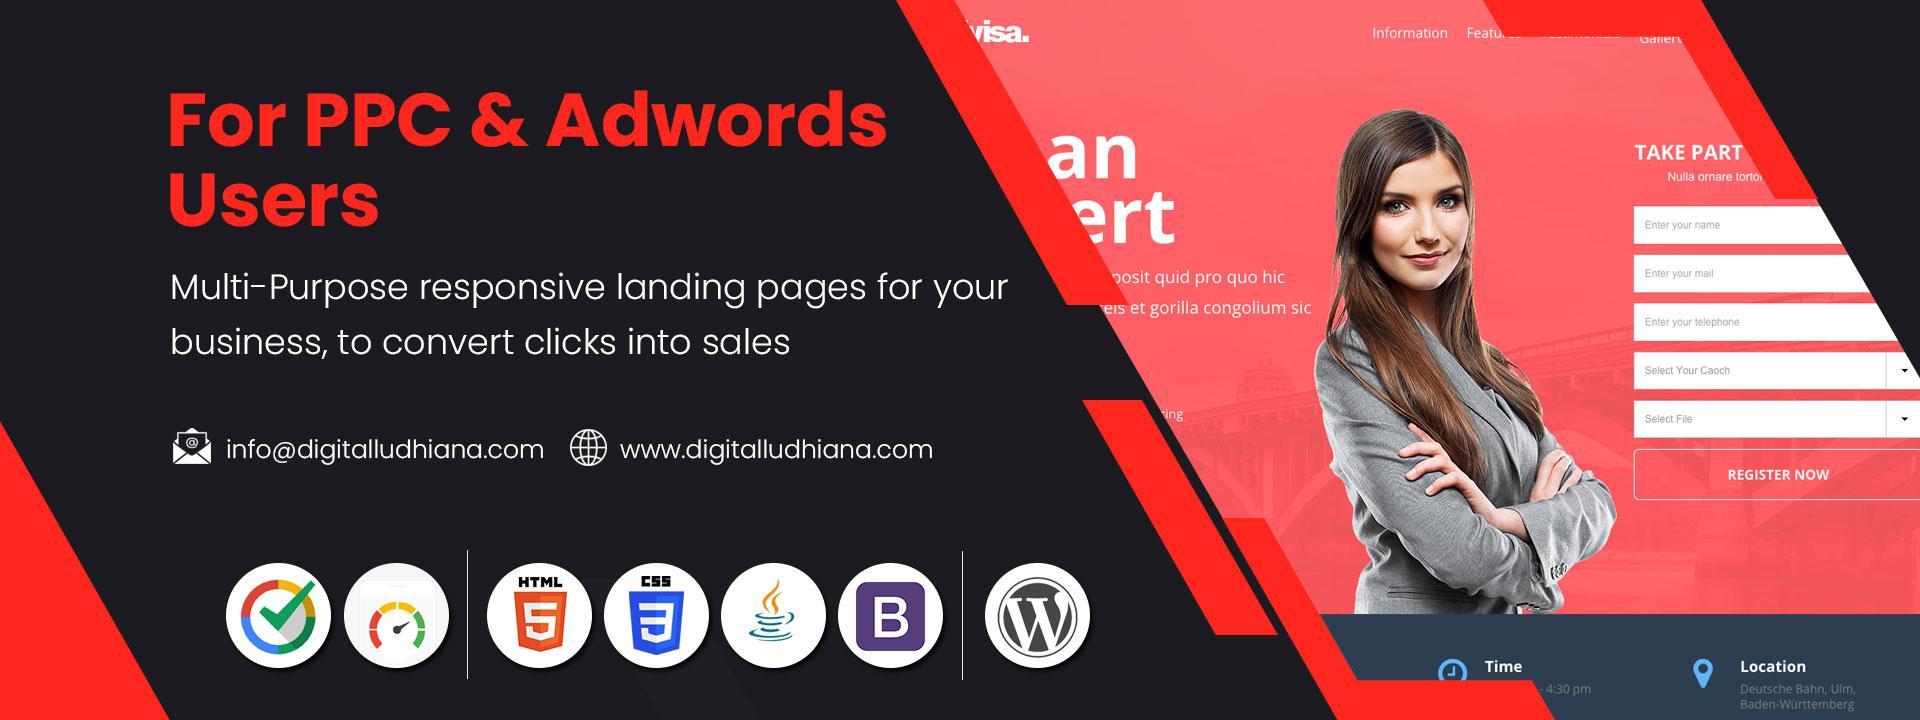 landing page designers in ludhiana punjabi india